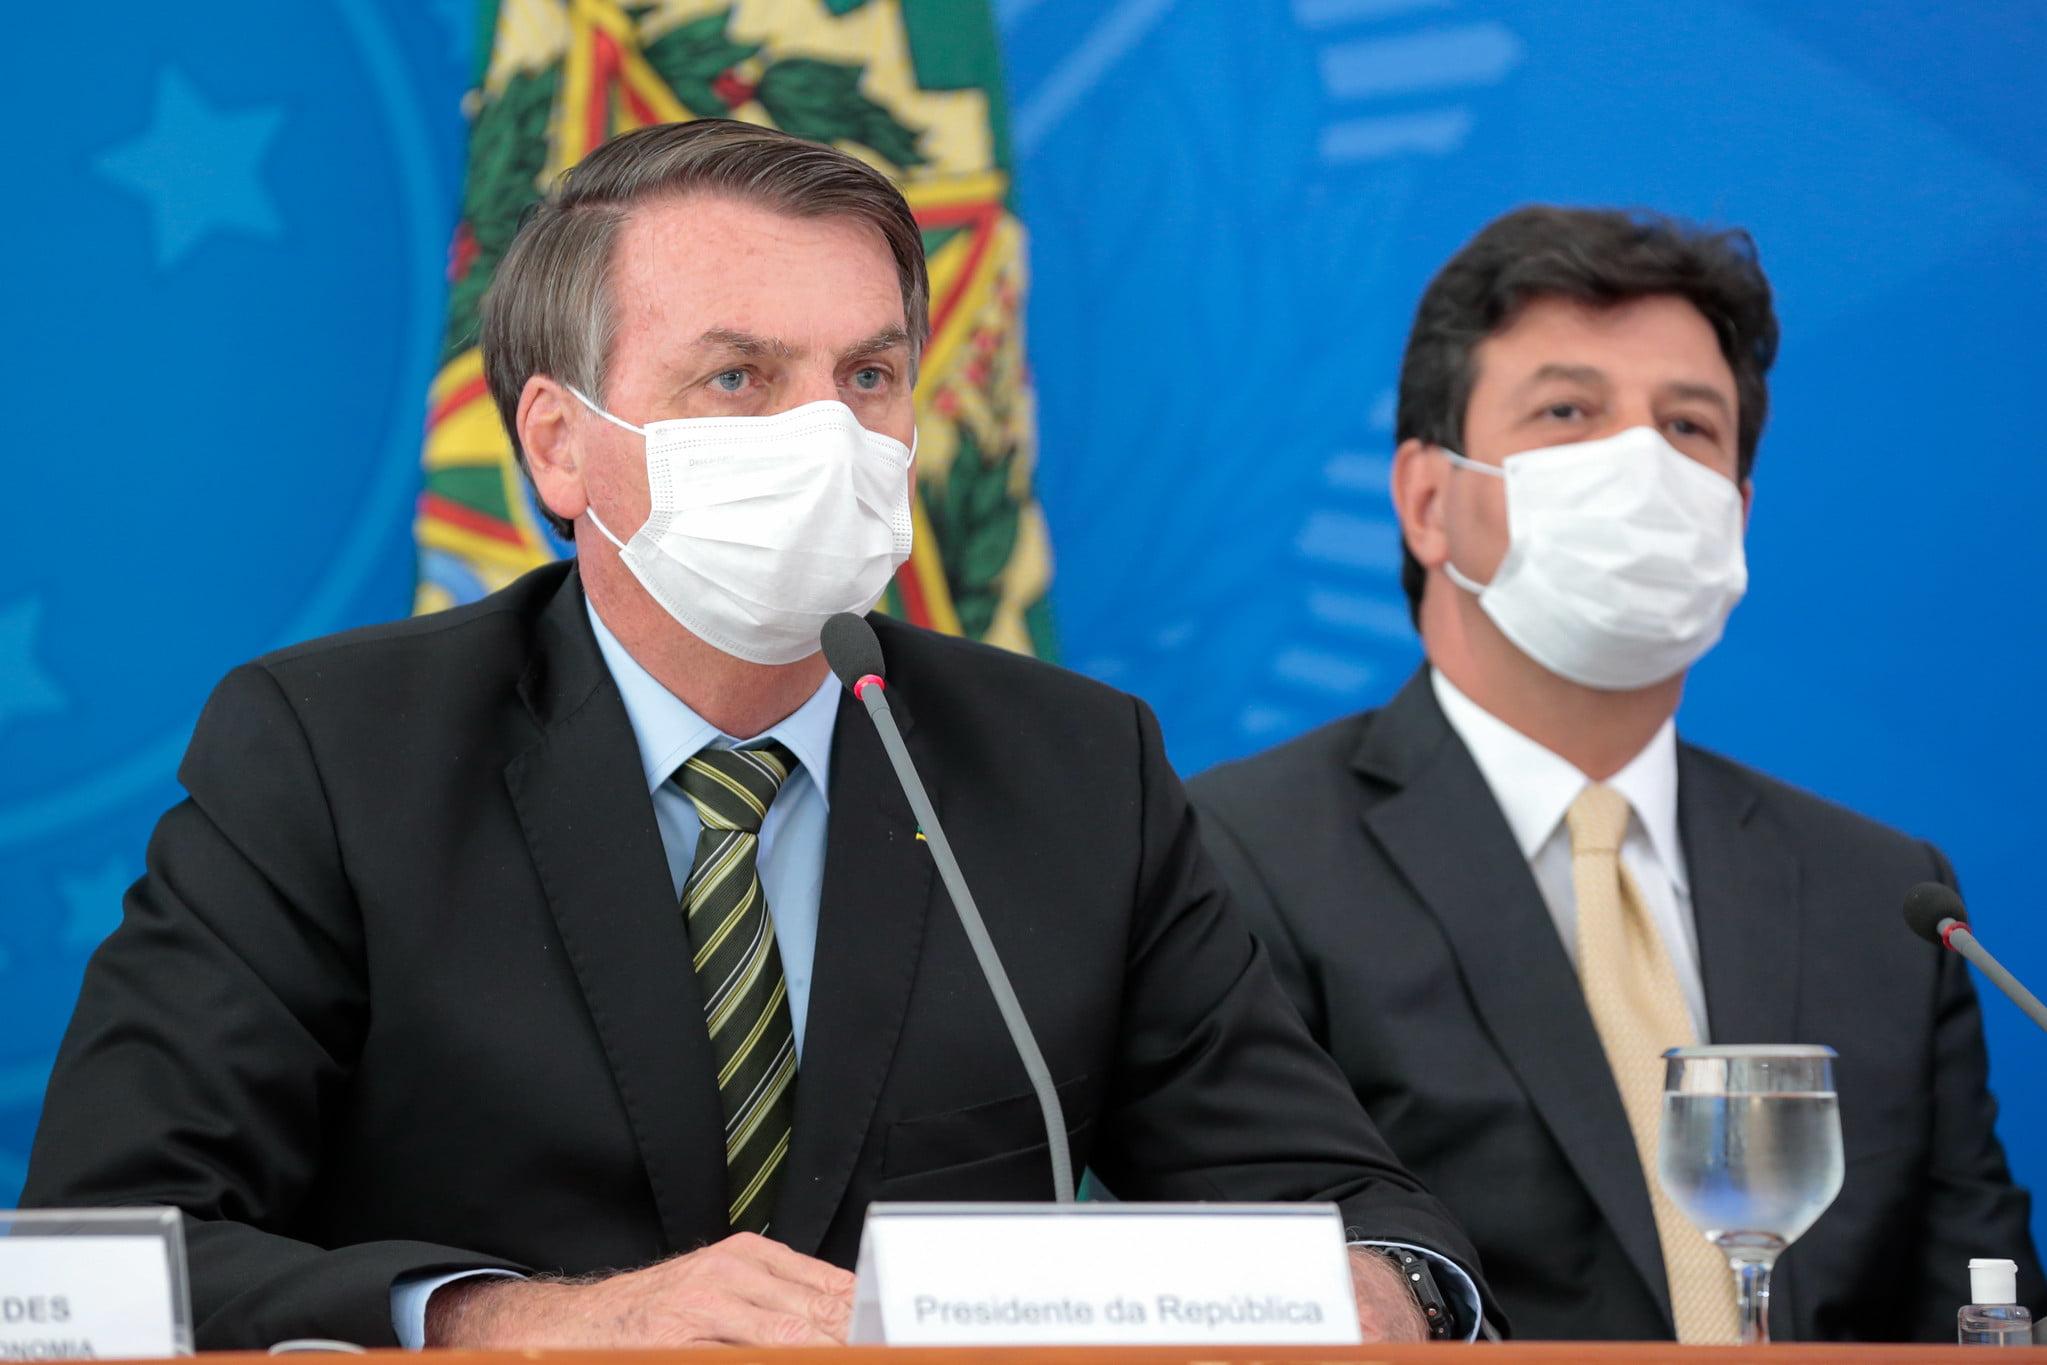 Presidente Jair Bolsonaro e Ministro da Saúde Henrique Mandetta